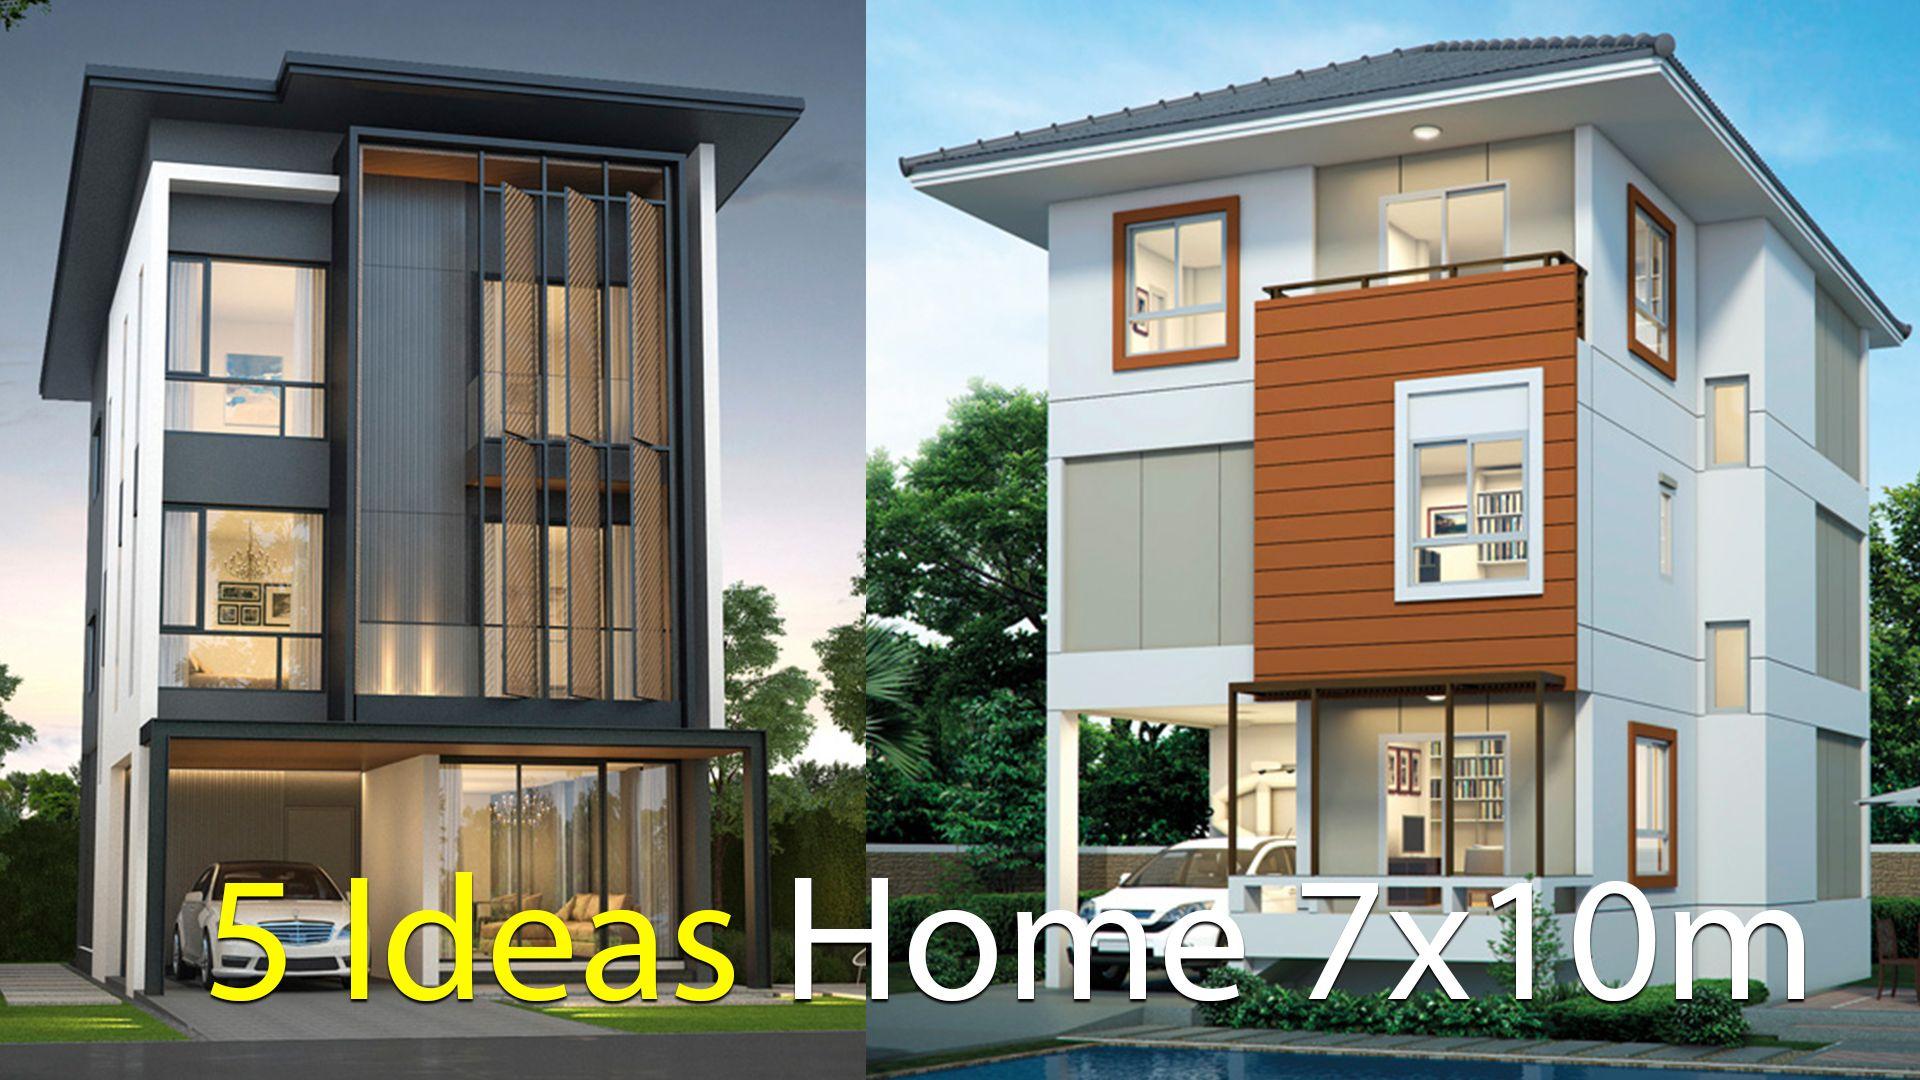 5 Ideas Home Design Plan 7x10m 1 House Design Plan 7x10 With 4 Bedrooms 2 Home Design Plan 7x10m With 4 Home Design Plan Duplex House Design House Floor Plans